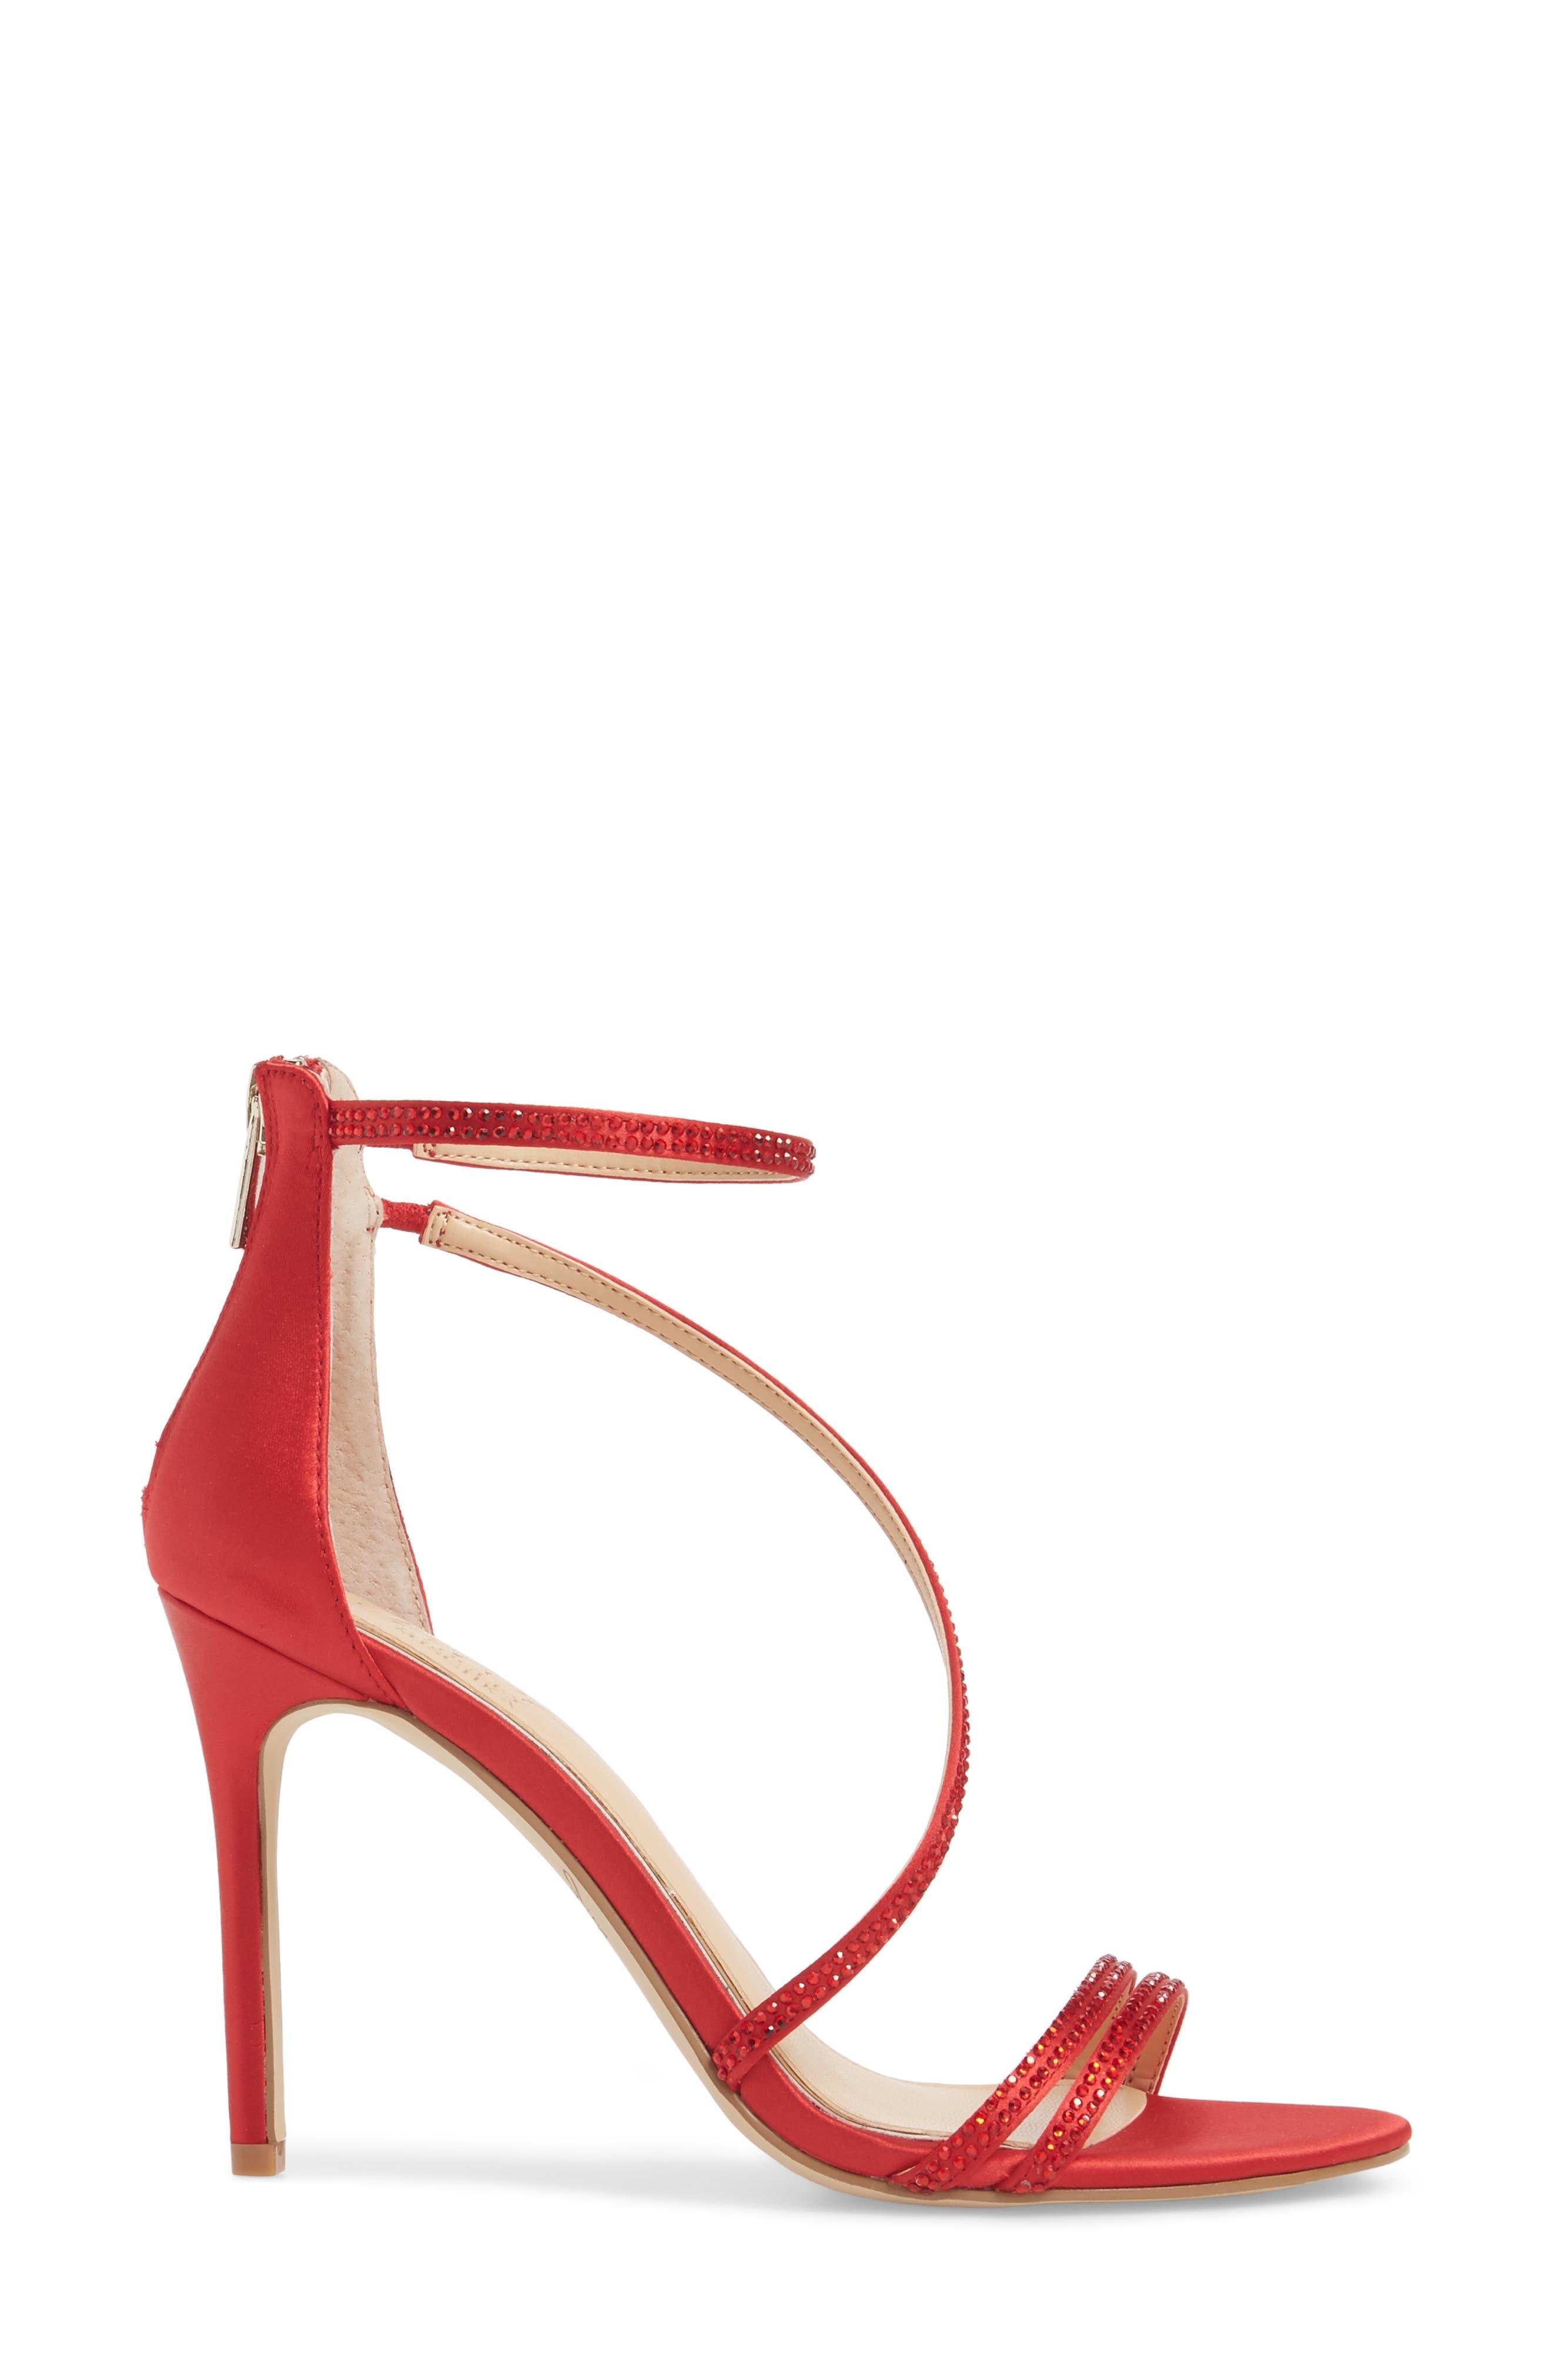 Gail Crystal Embellished Sandal,                             Alternate thumbnail 3, color,                             Red Satin